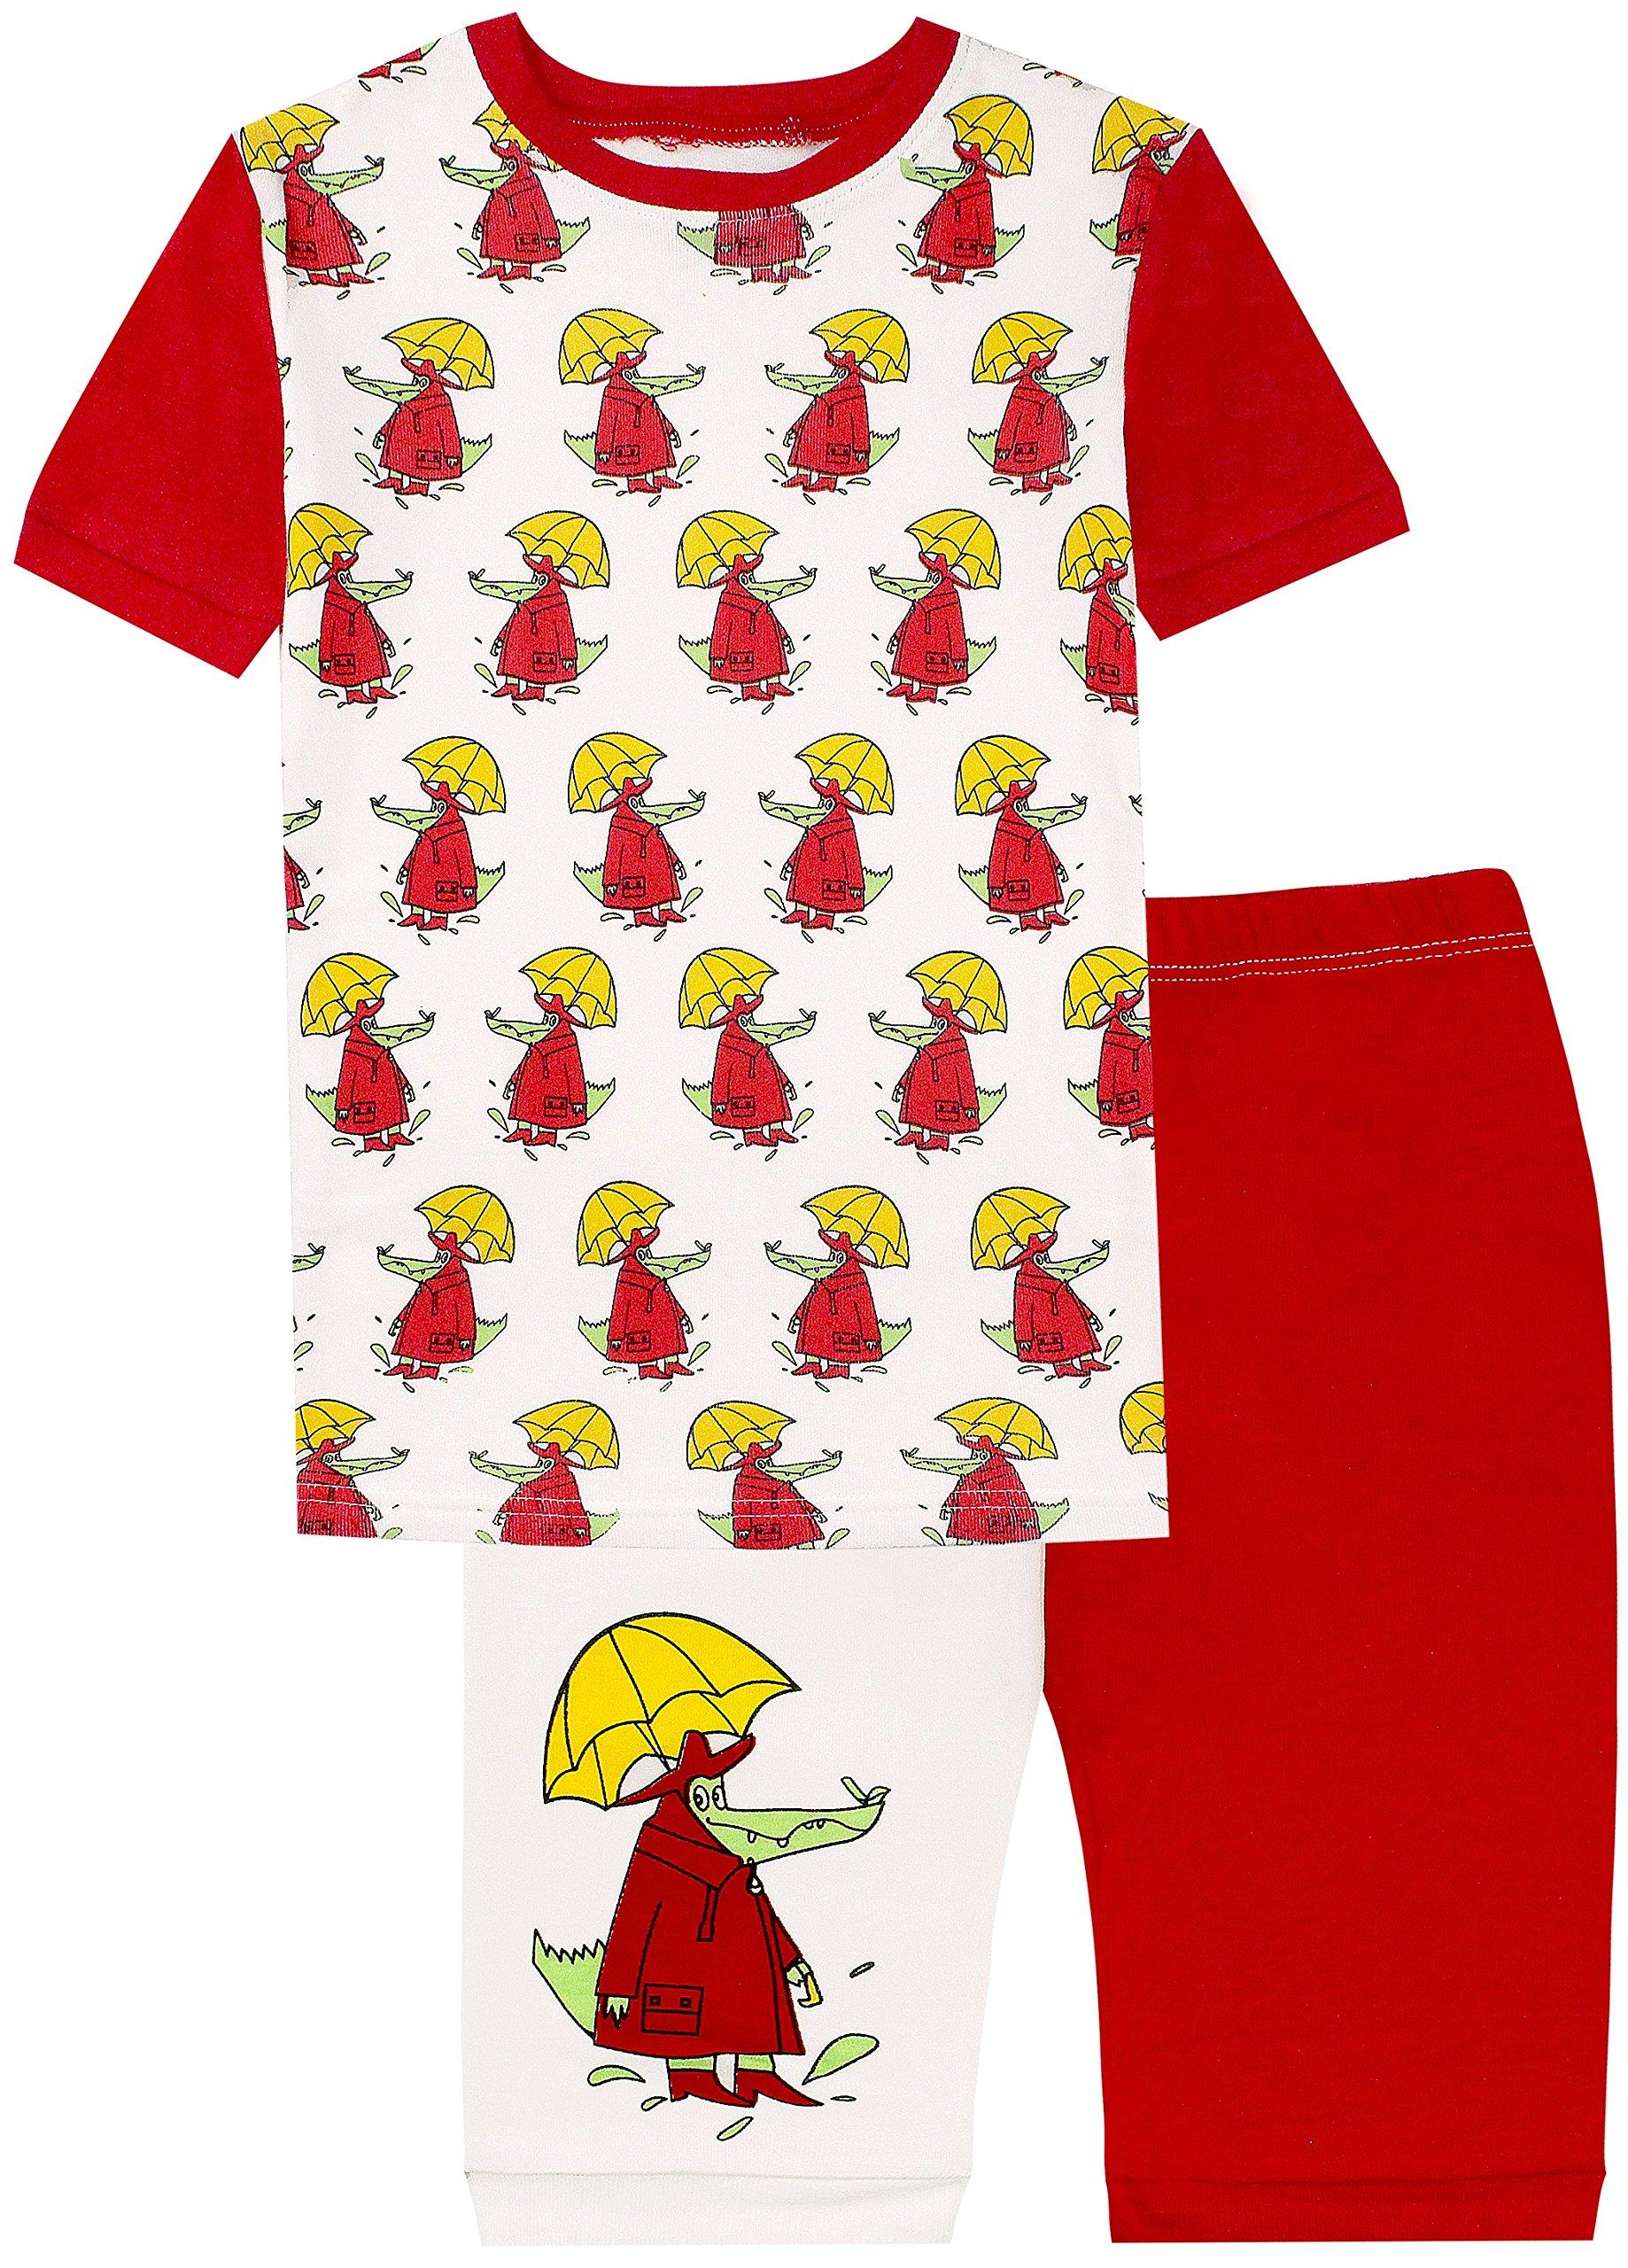 shelry Little?Boys?Pajamas?Kids?Shorts?Sets?Crocodile?100%?Cotton?Summer Shirts Kids Toddler Pajamas Set 8Y